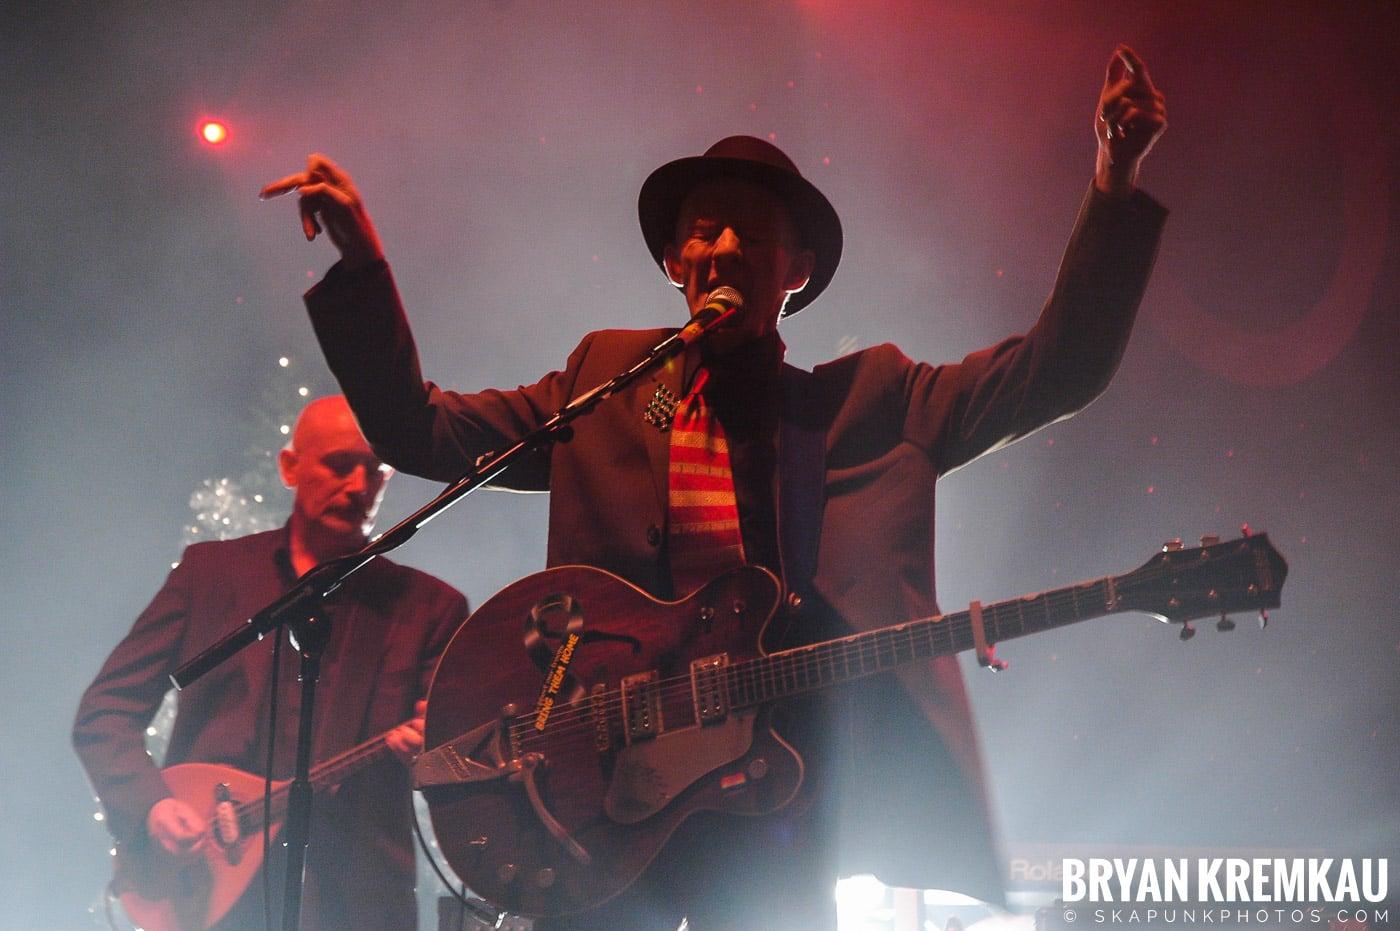 The Pogues @ Brixton Academy, London UK - 12.19.05 (5)